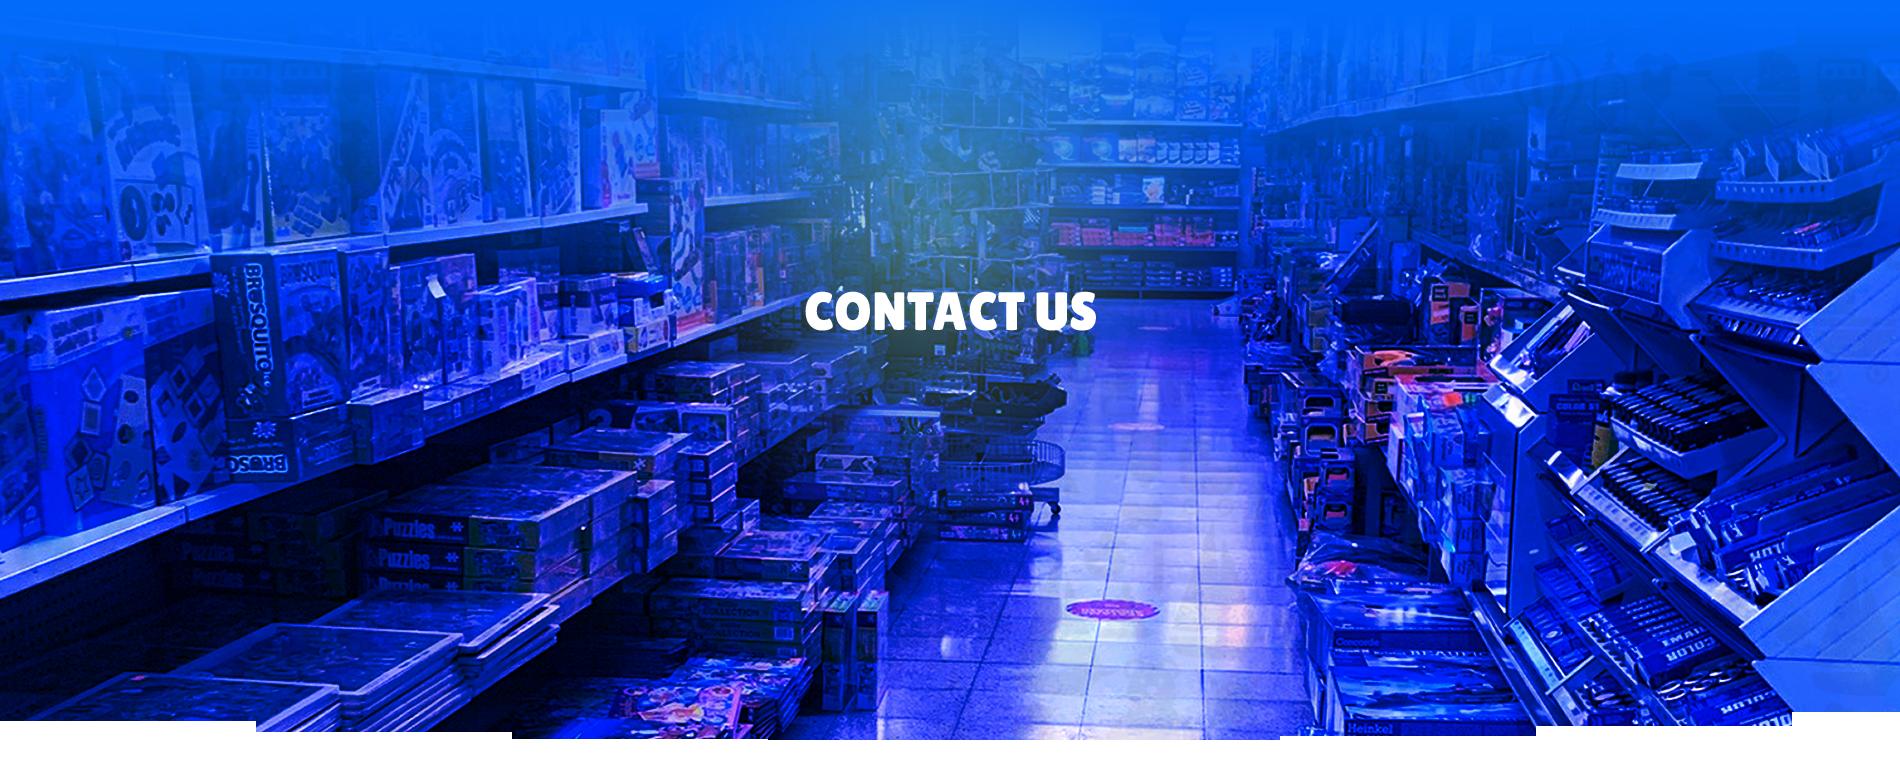 Contact us img